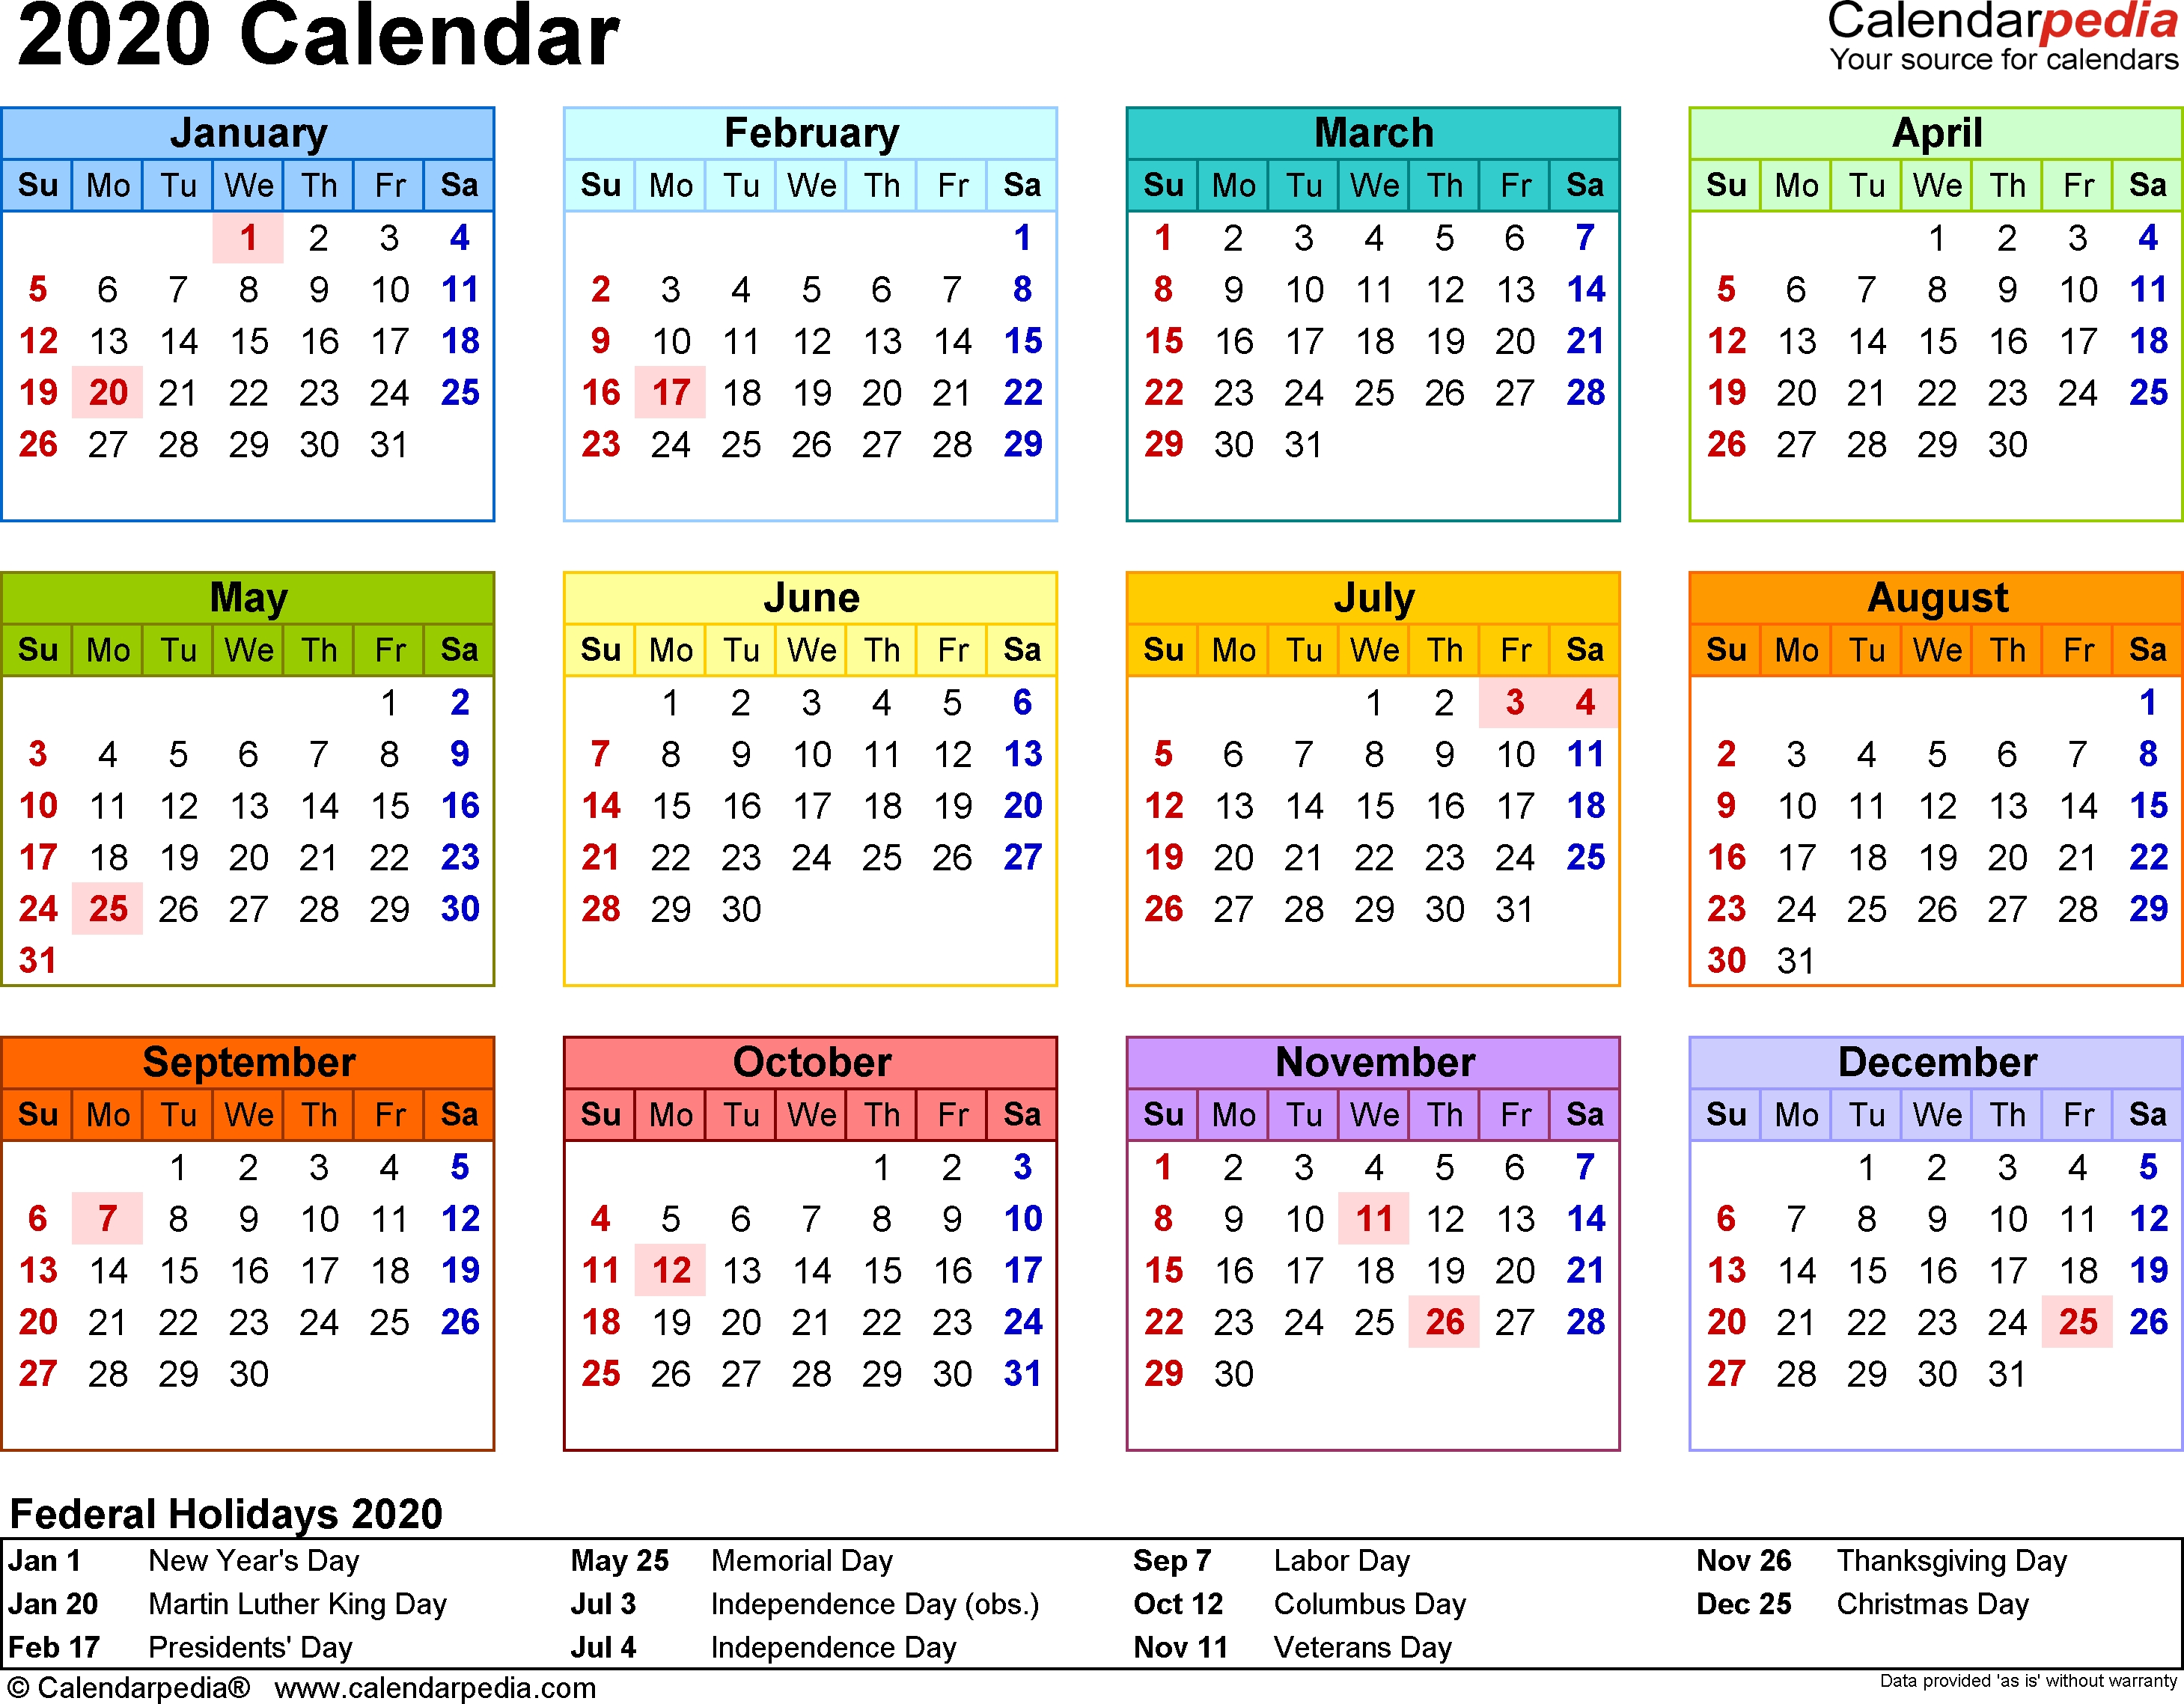 2020 Calendar - 17 Free Printable Word Calendar Templates inside Employee Attendance Calendar 2020 Prntable